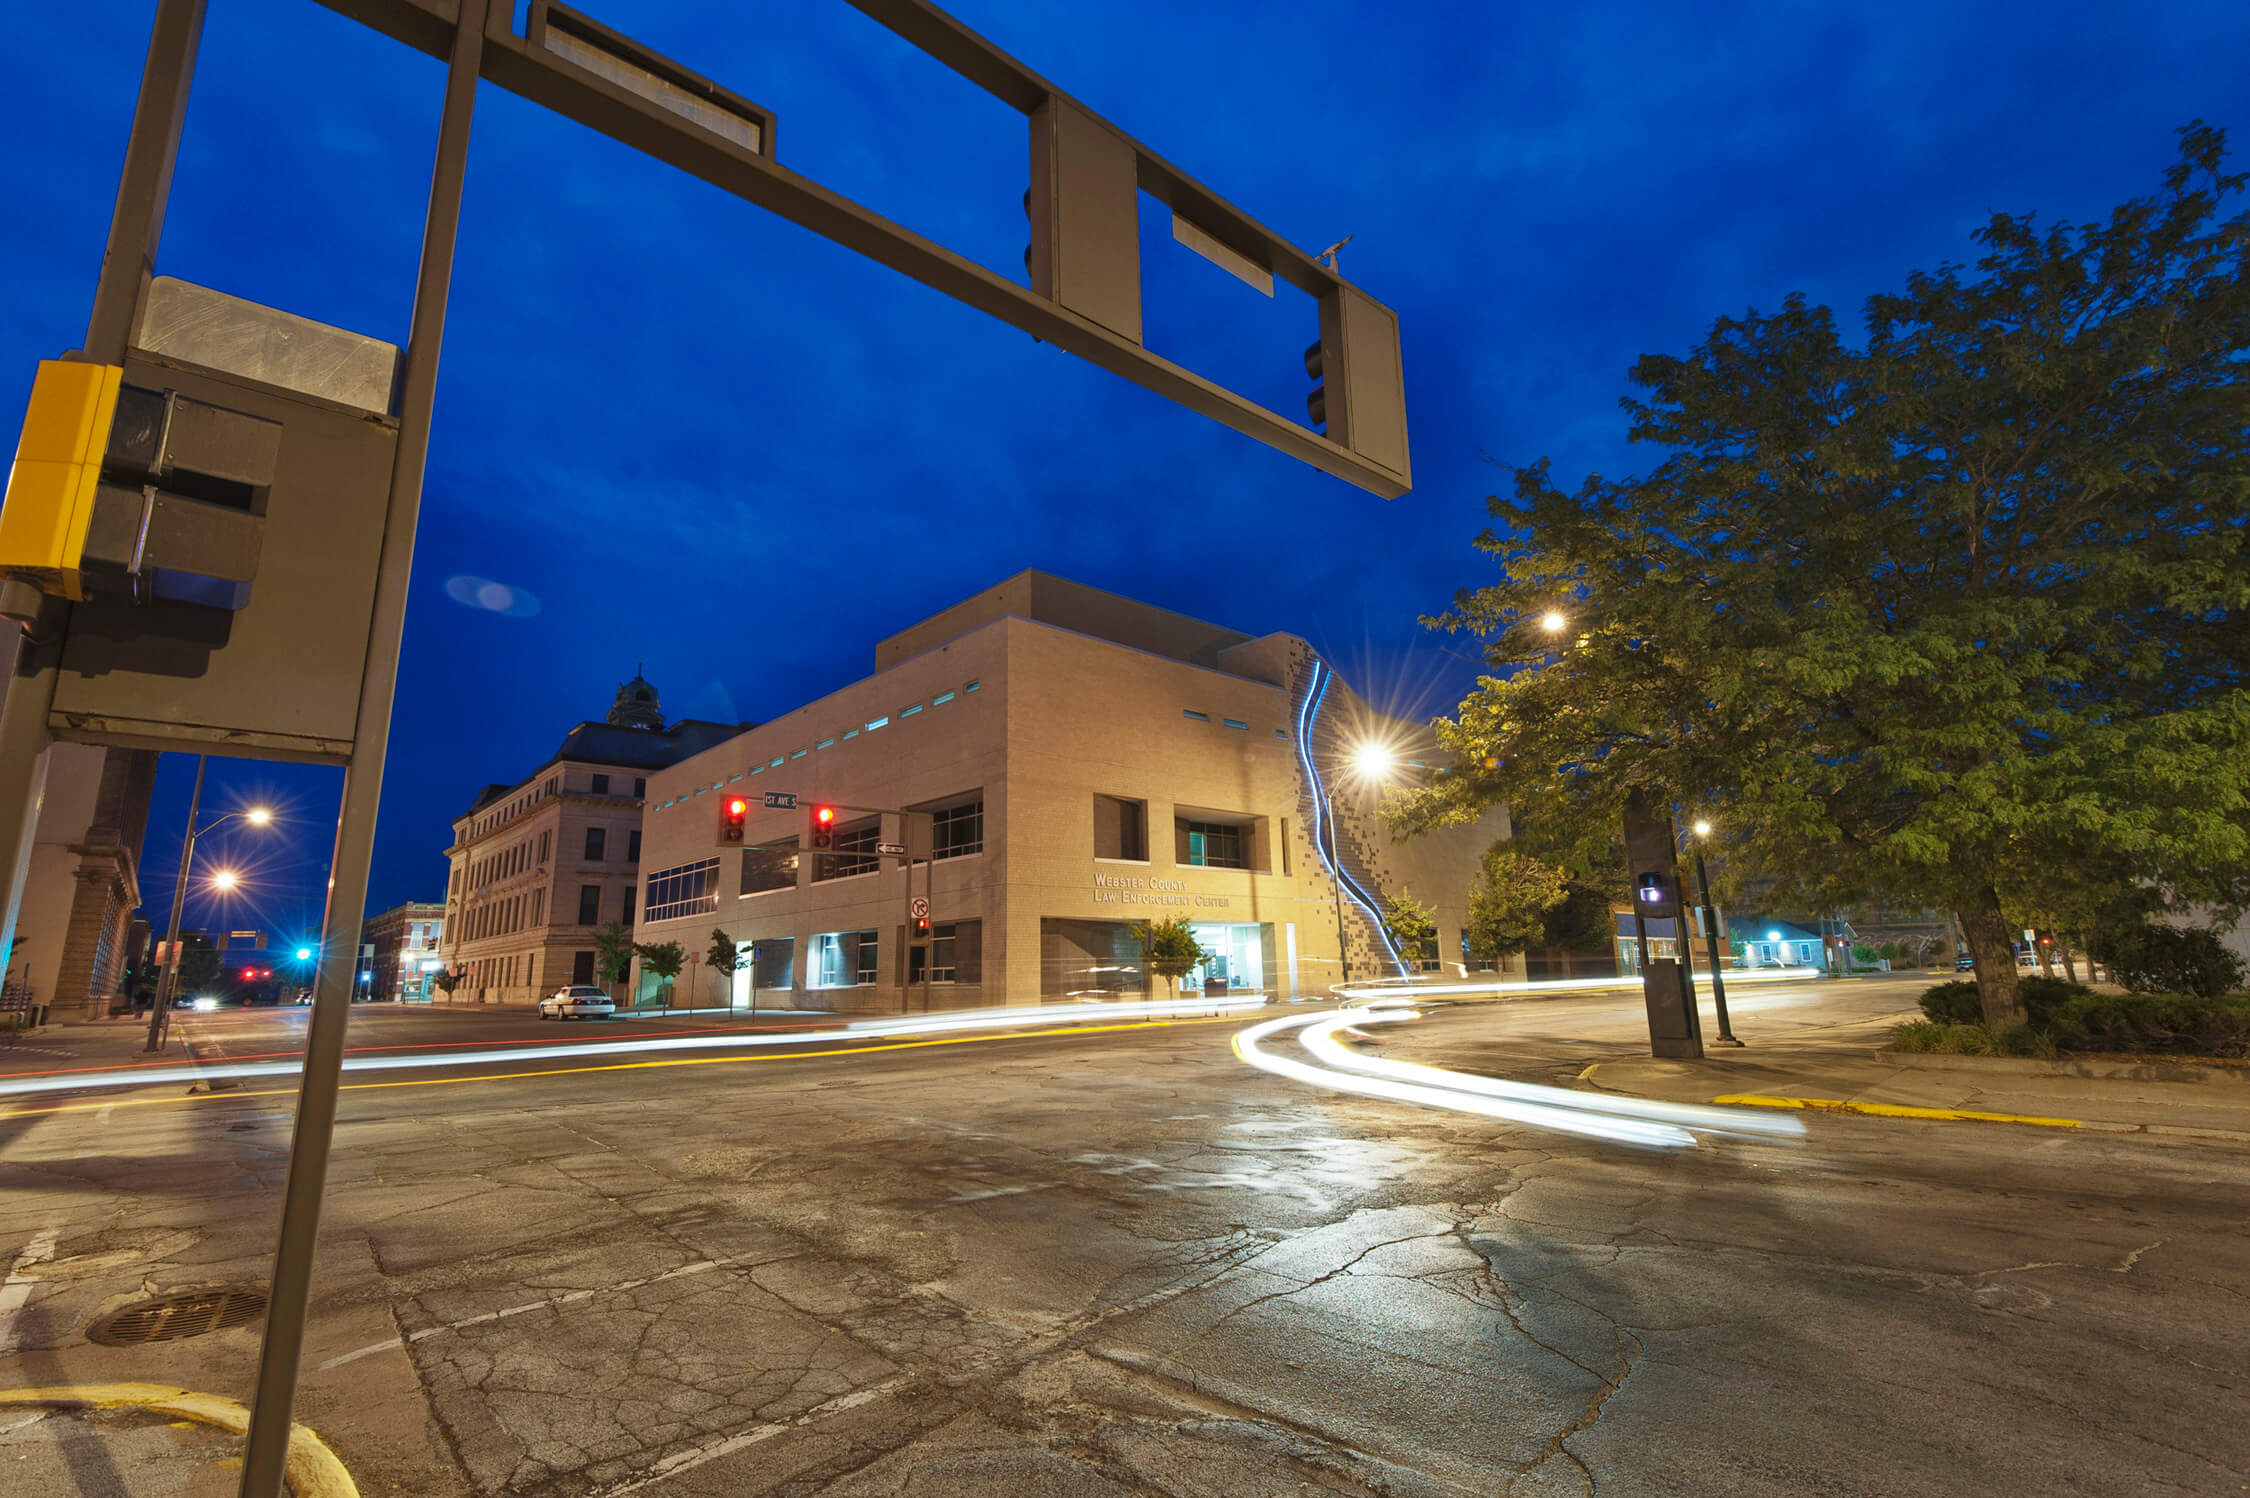 Webster-County-Law-Enforcement-Center-68